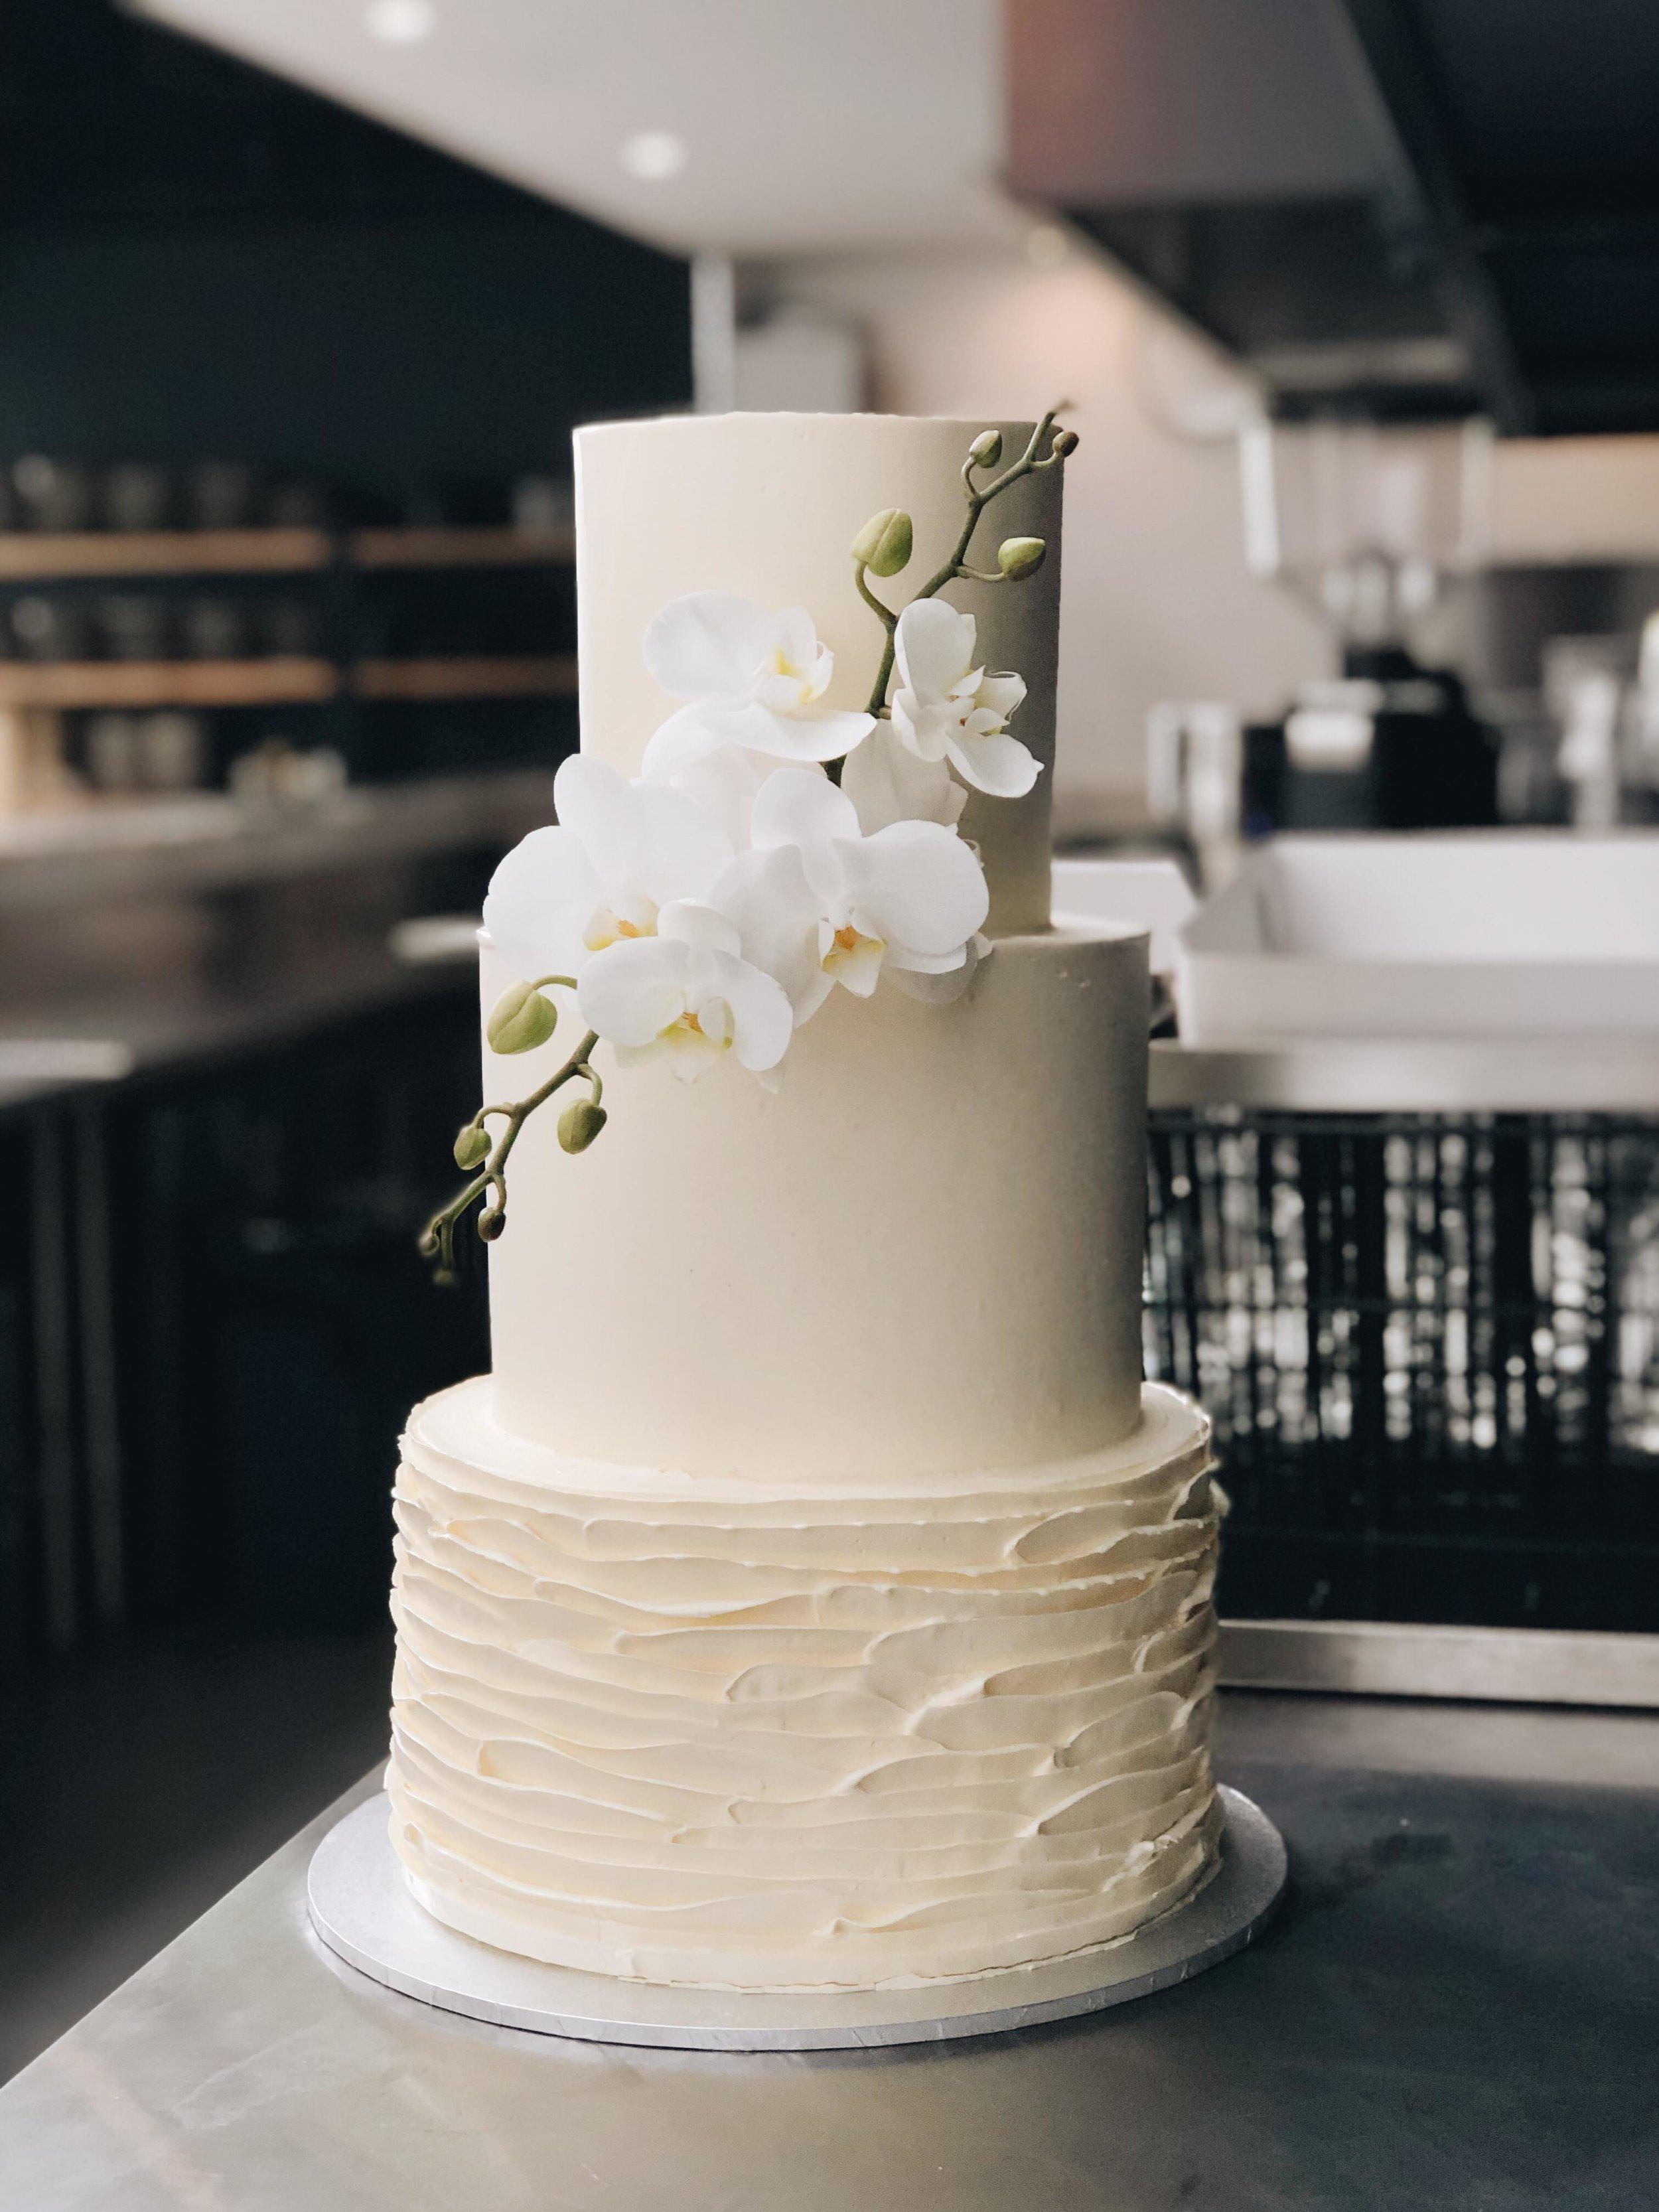 3 Tier Classic Elegant Wedding Custom Passiontree Velvet Cake